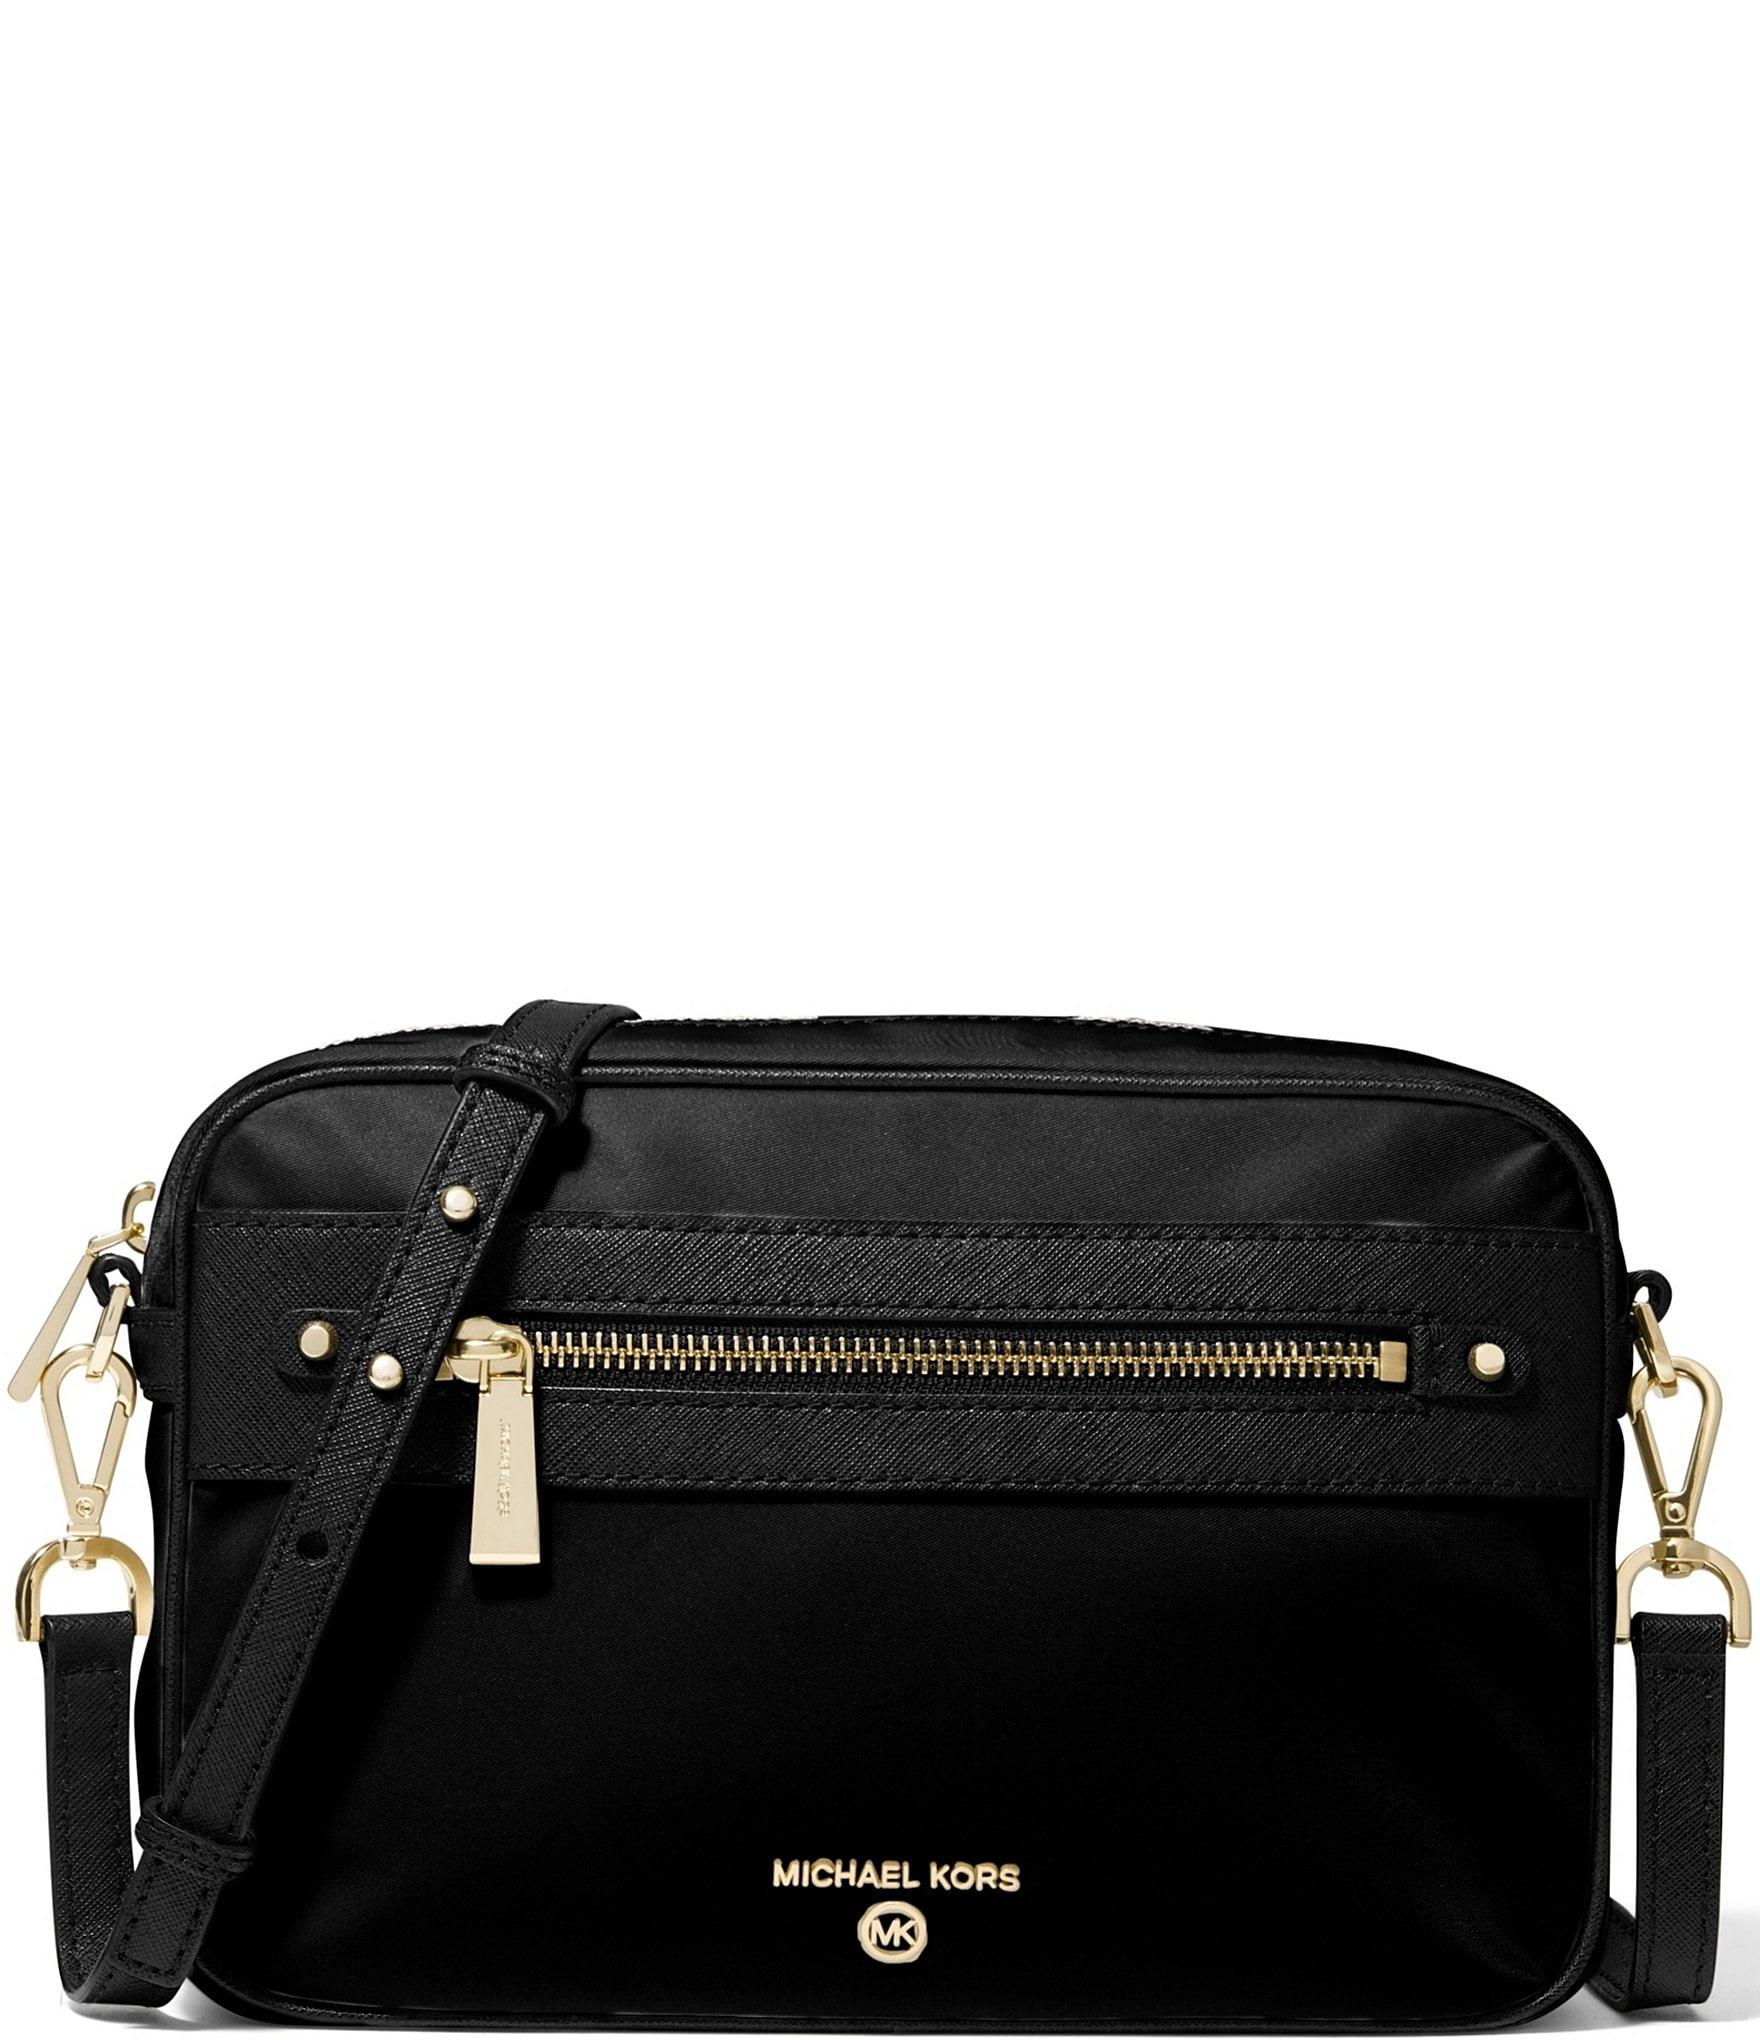 Ladies Flap Bag Soft Cross-body Messenger Bags Chain Strap Shoulder Handbag New